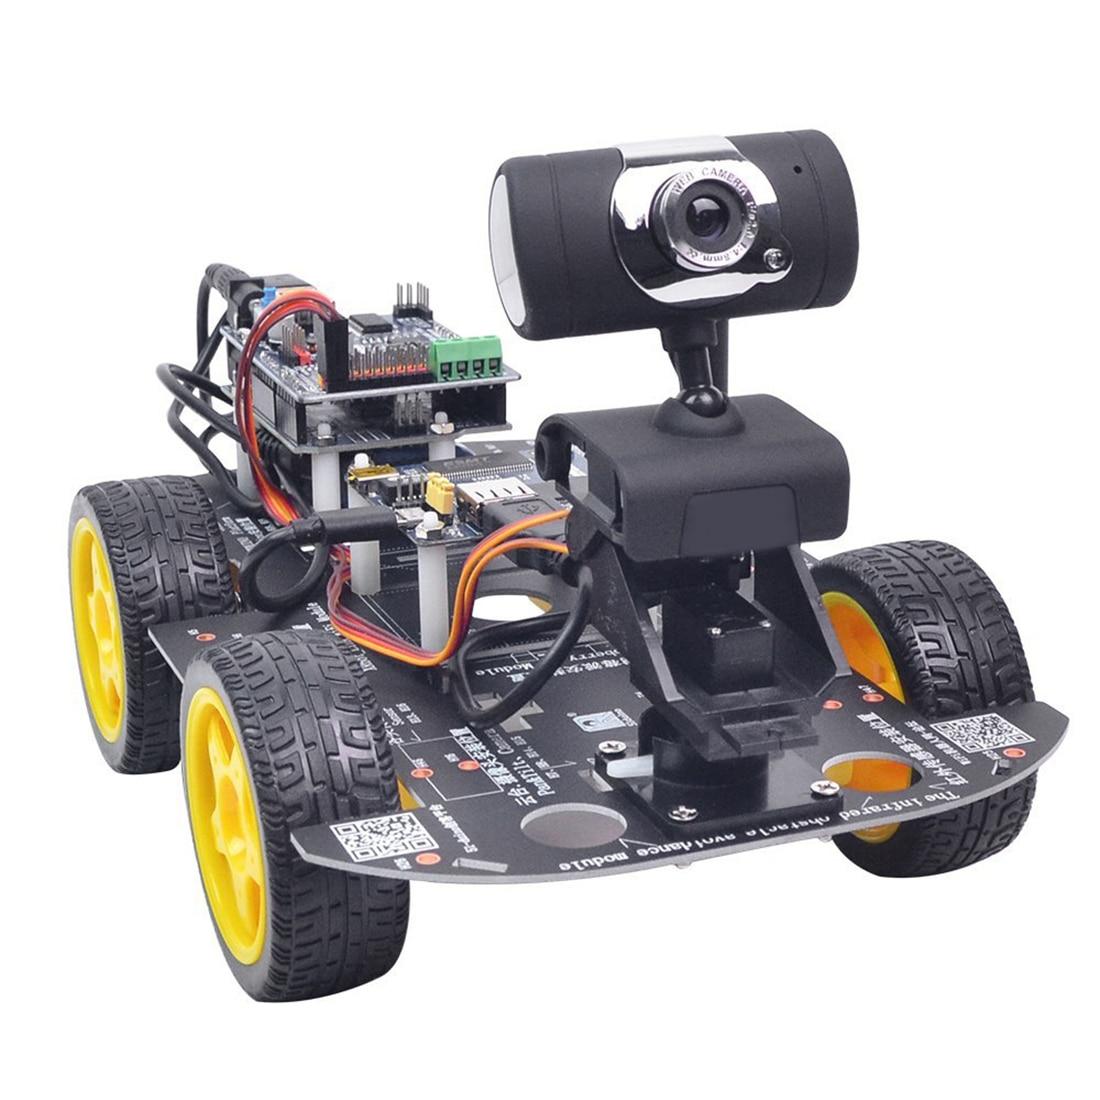 New DIY Programmable Robot Car Wifi Steam Educational Car For Raspberry Pi 4 (2G) - Standard Edition US Plug